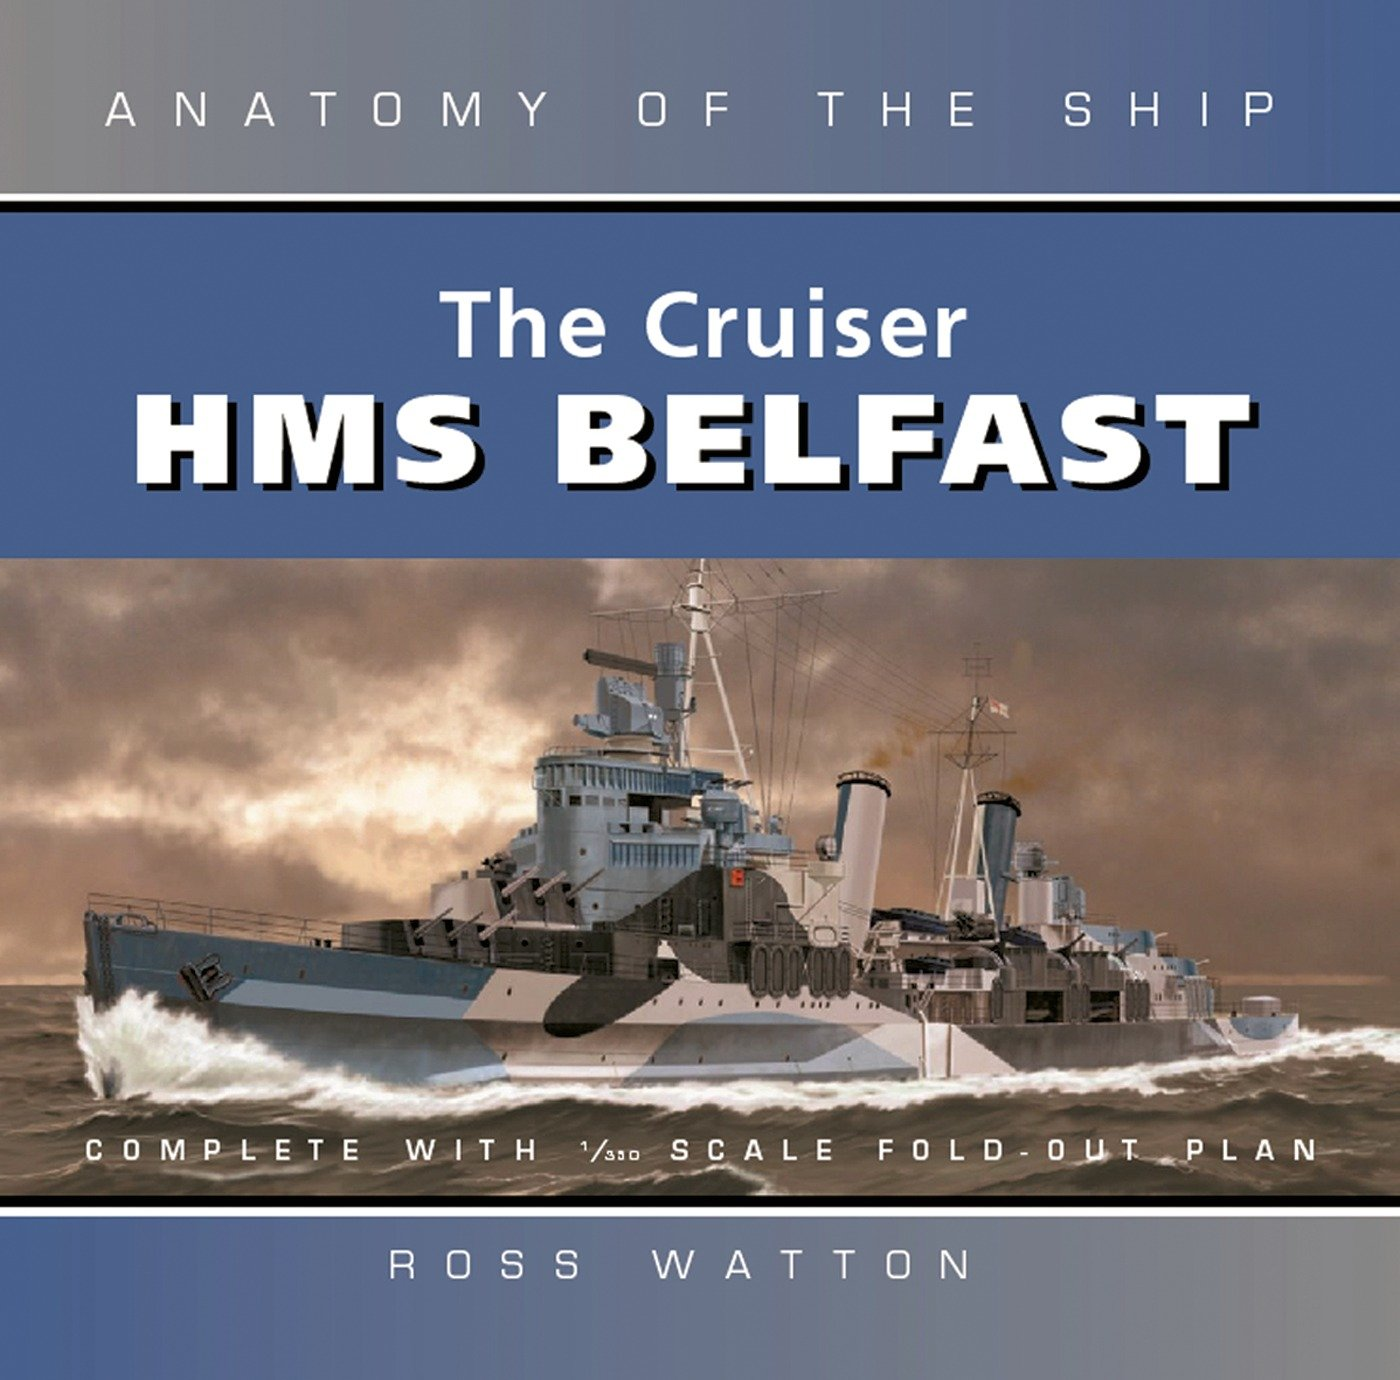 The Cruiser Belfast Anatomy Of The Ship Ross Watton